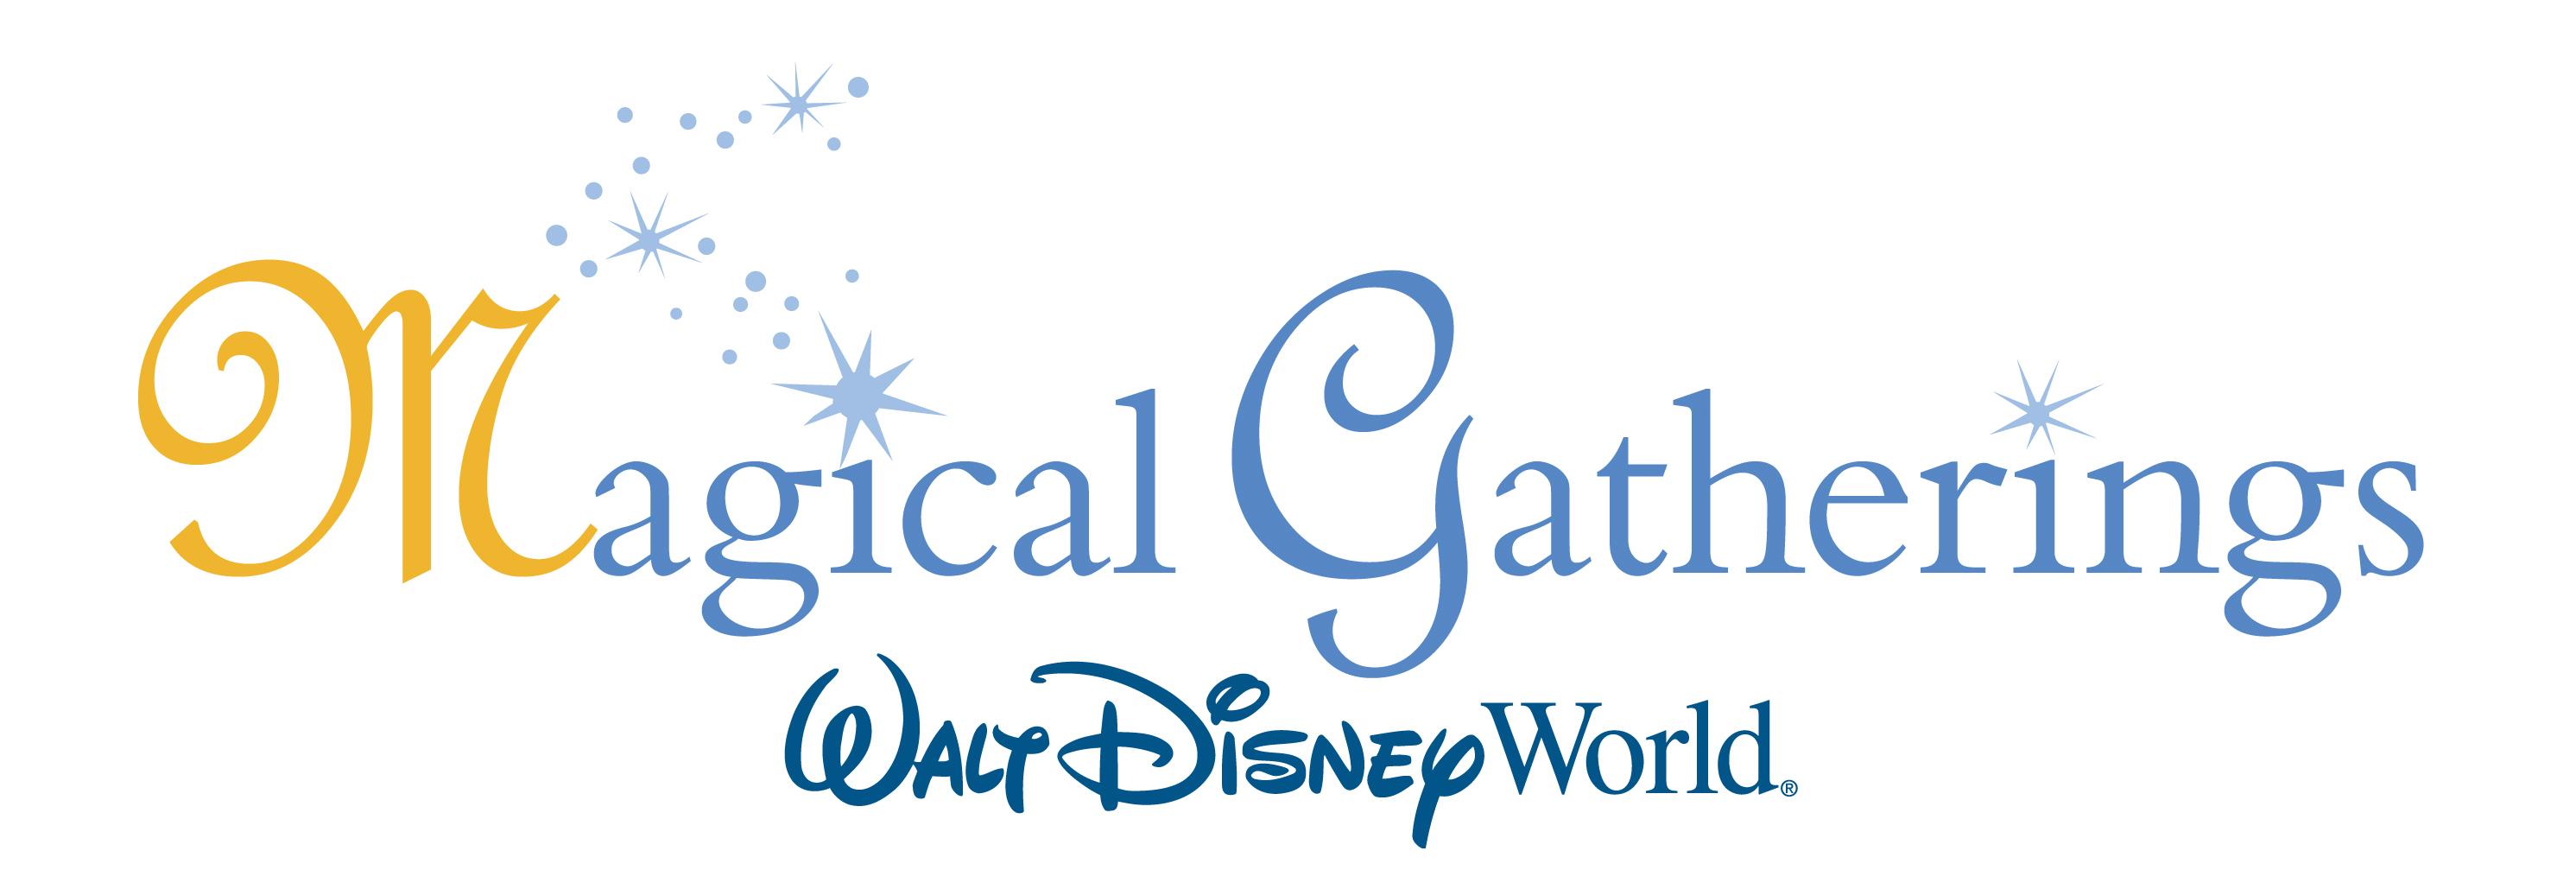 Disney world magic kingdom clipart clip stock Walt disney world logo clipart - ClipartFest clip stock